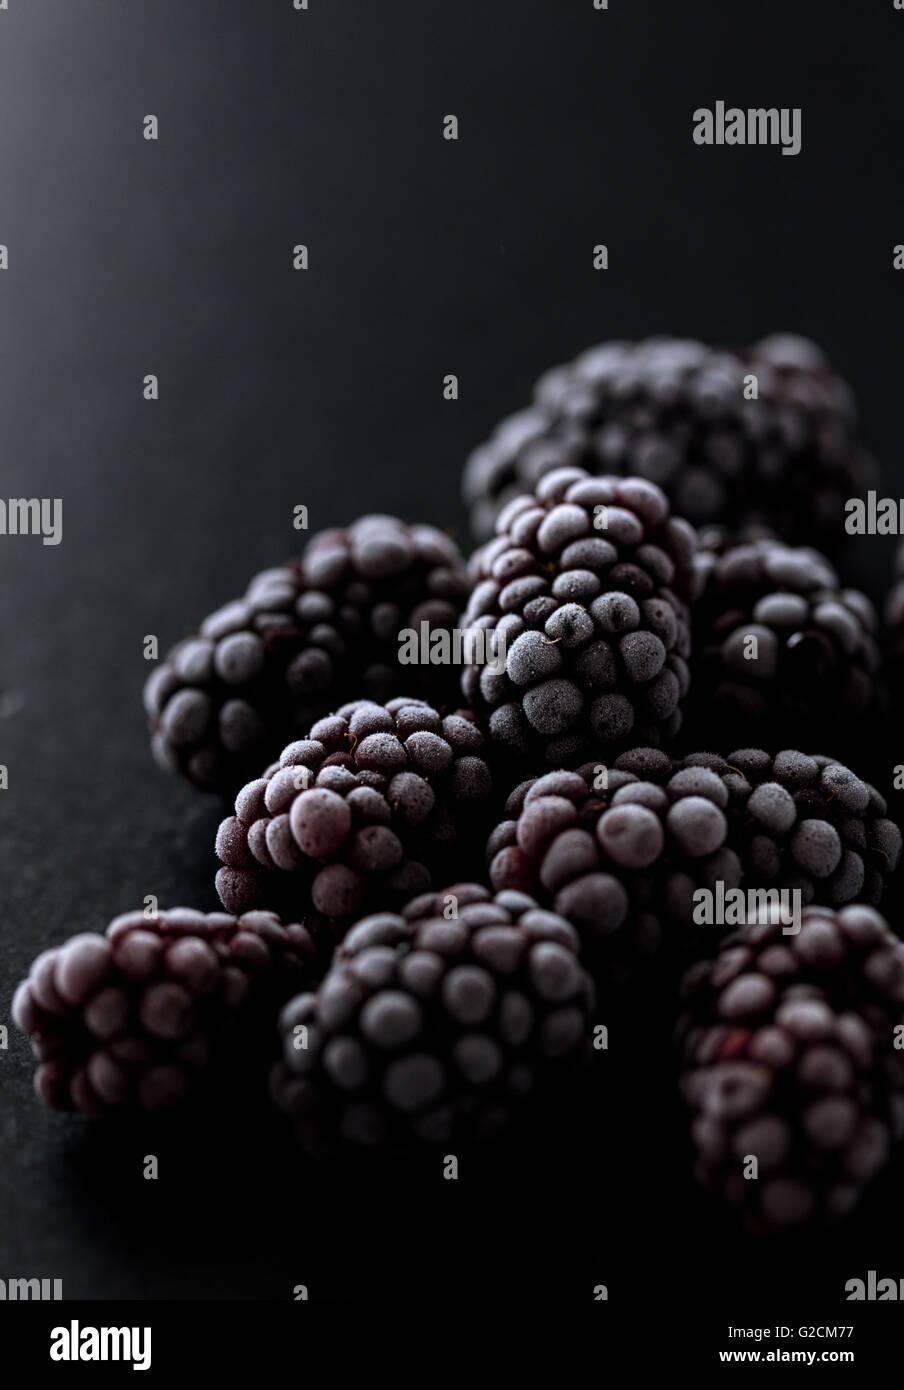 blackberries frozen on a black stone, macro photo showing a beautiful ice texture Stock Photo